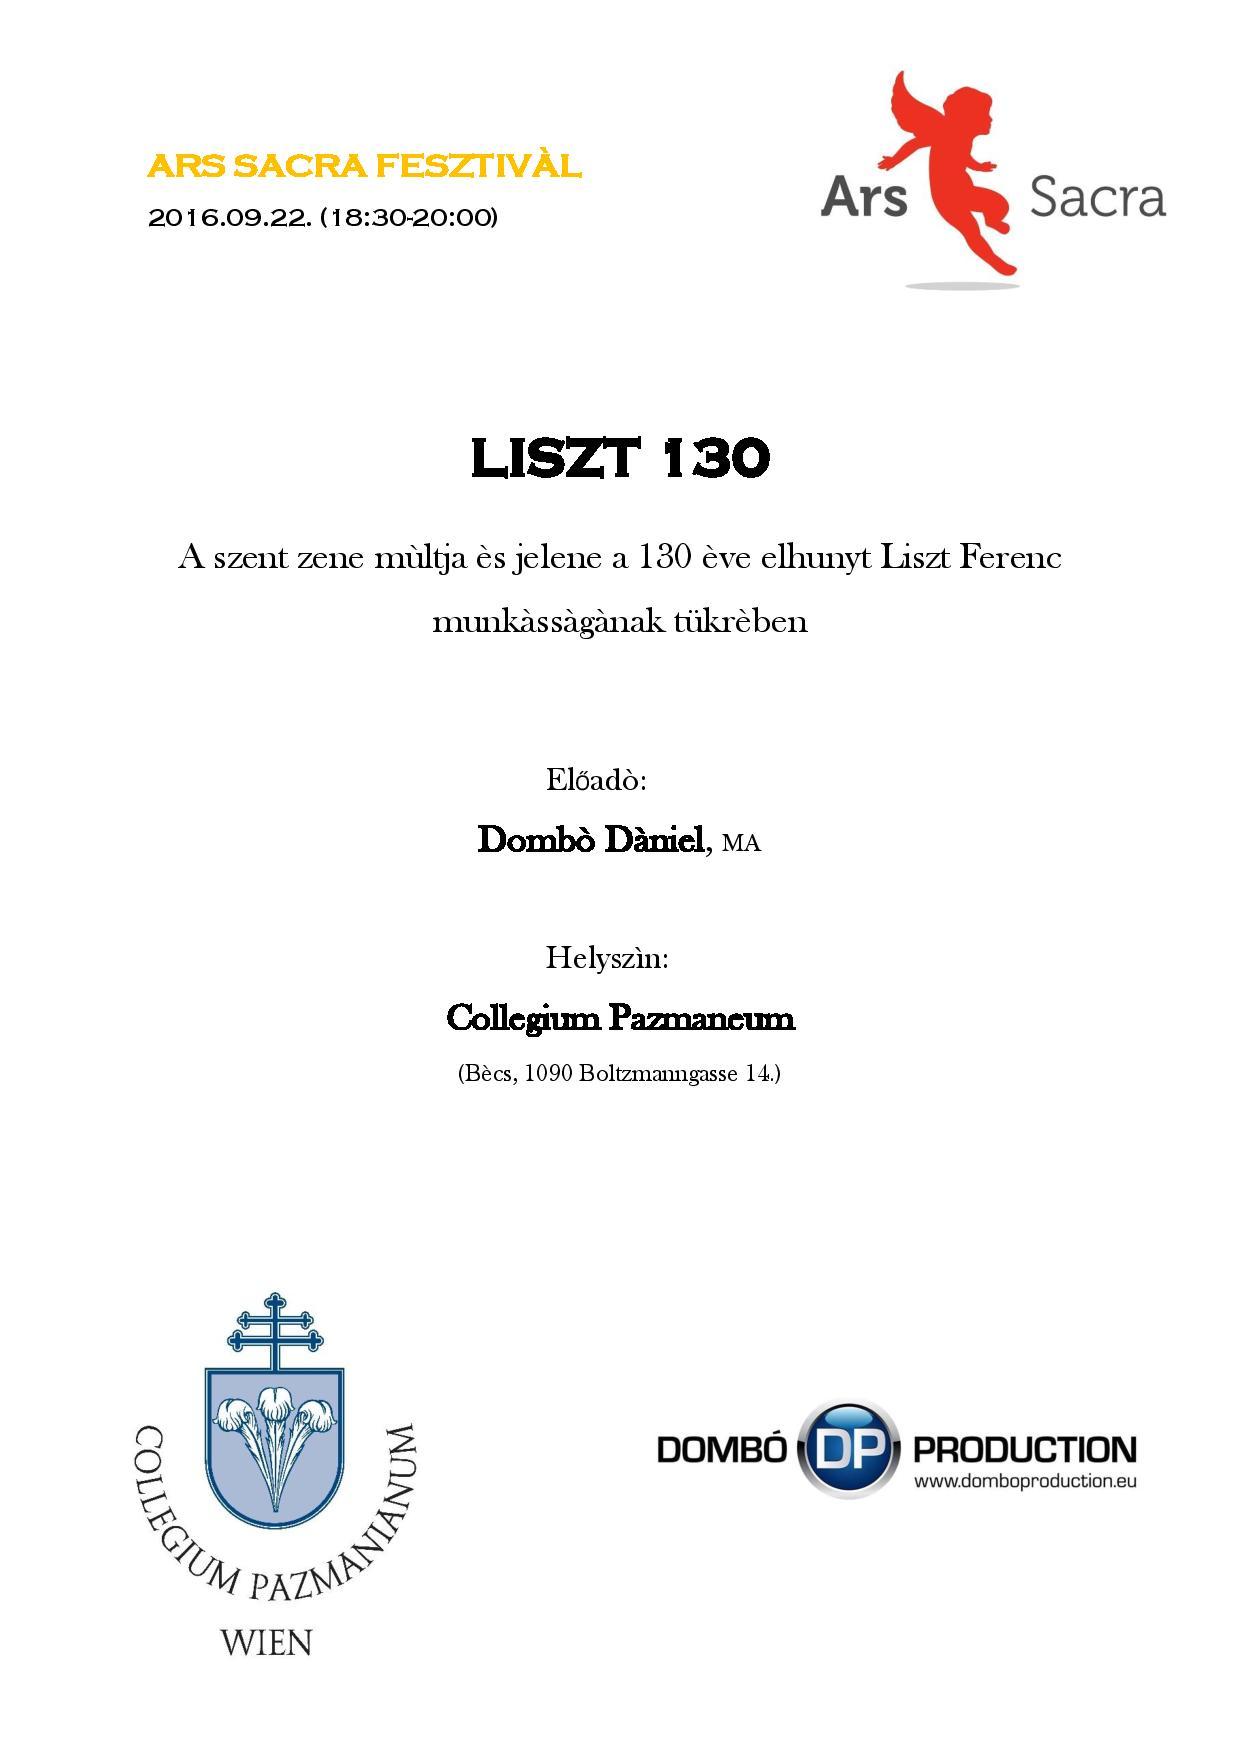 liszt-130-plakat-page-001